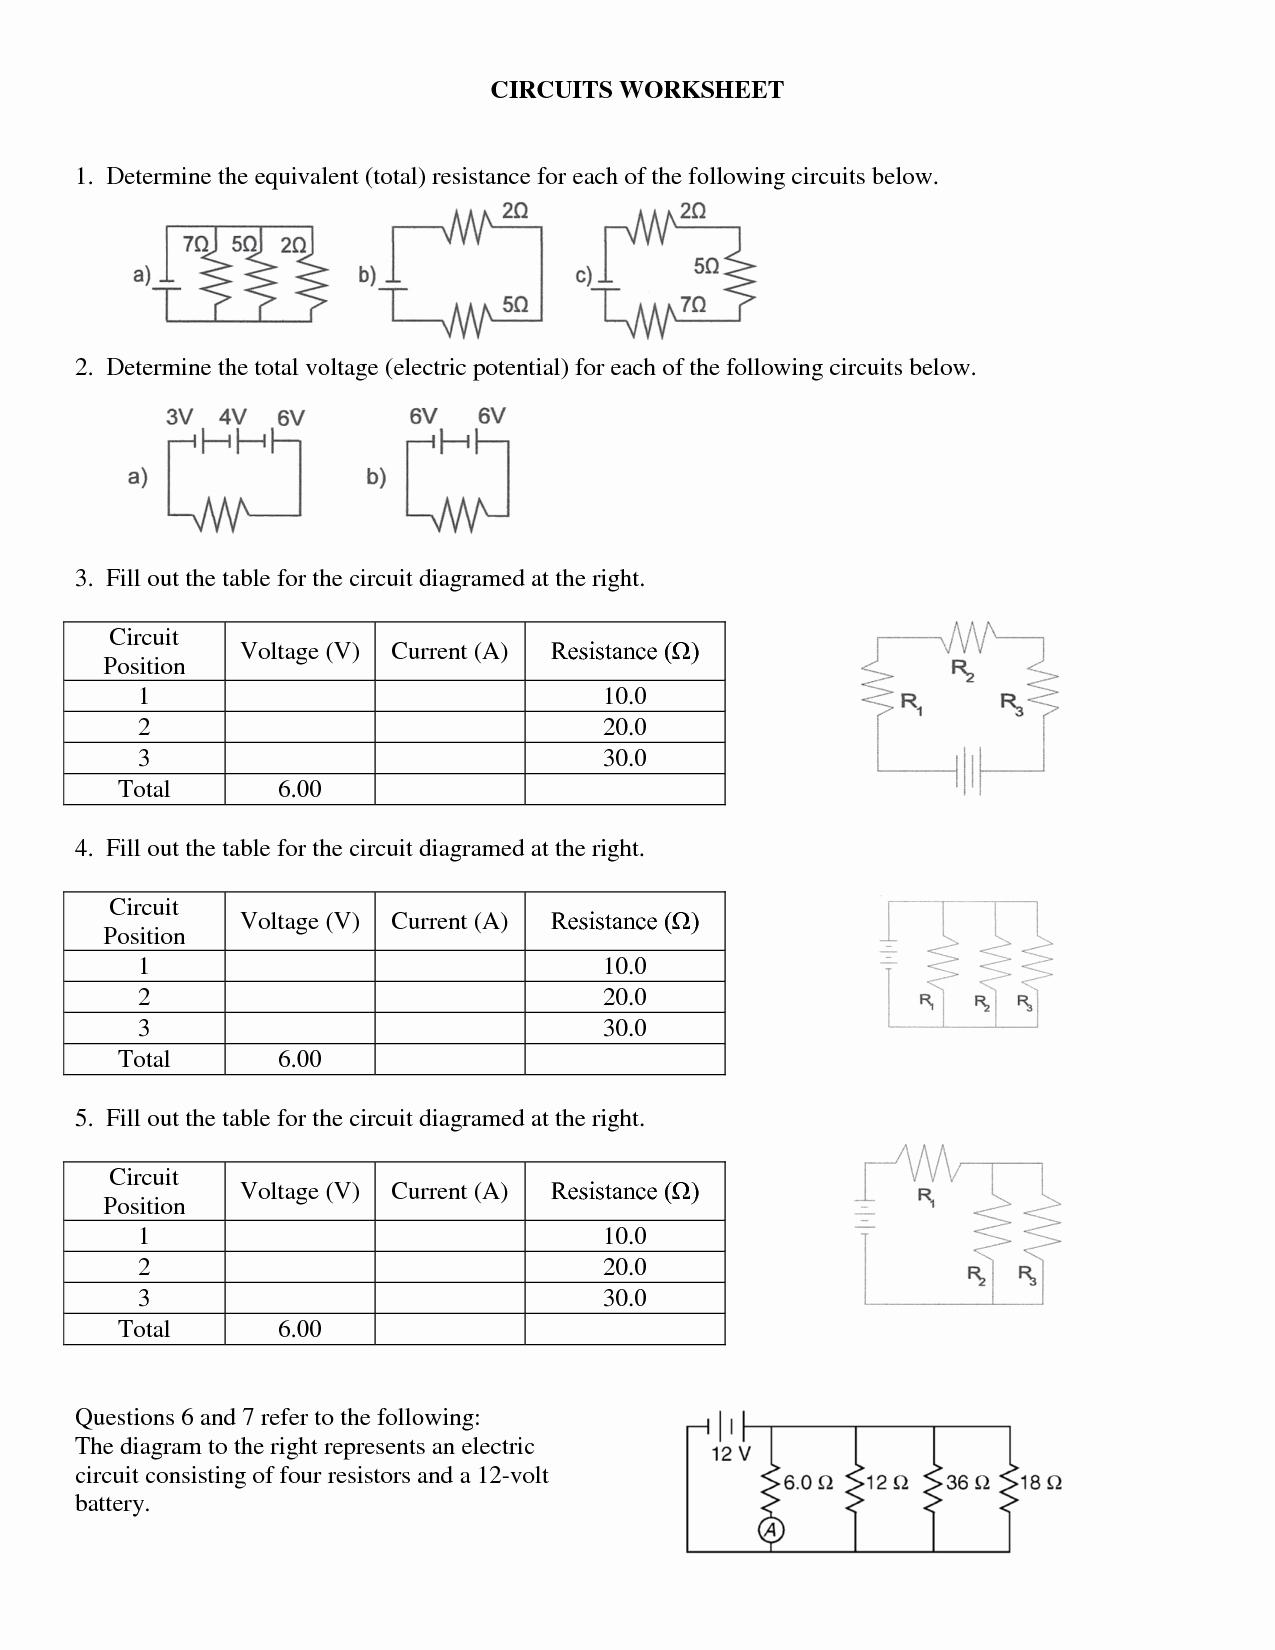 Circuits Worksheet Answer Key Beautiful 15 Electrical Circuits Worksheet A Series Circuit Problems